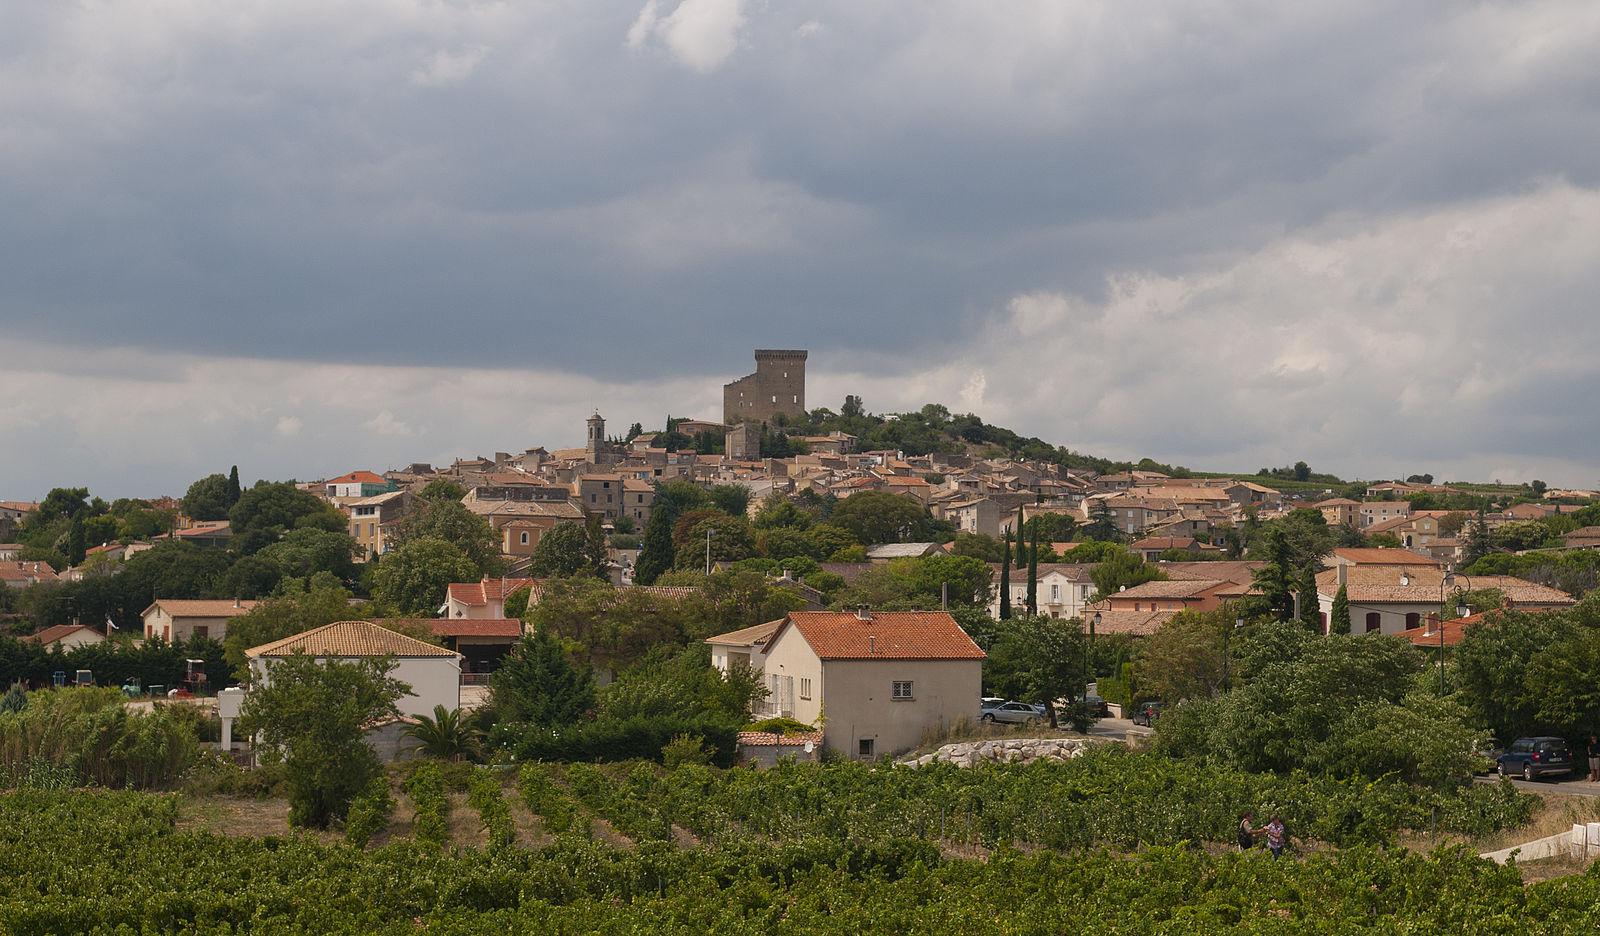 Châteauneuf-du-Pape,_Provence,_France_(6053048170) (1).jpg